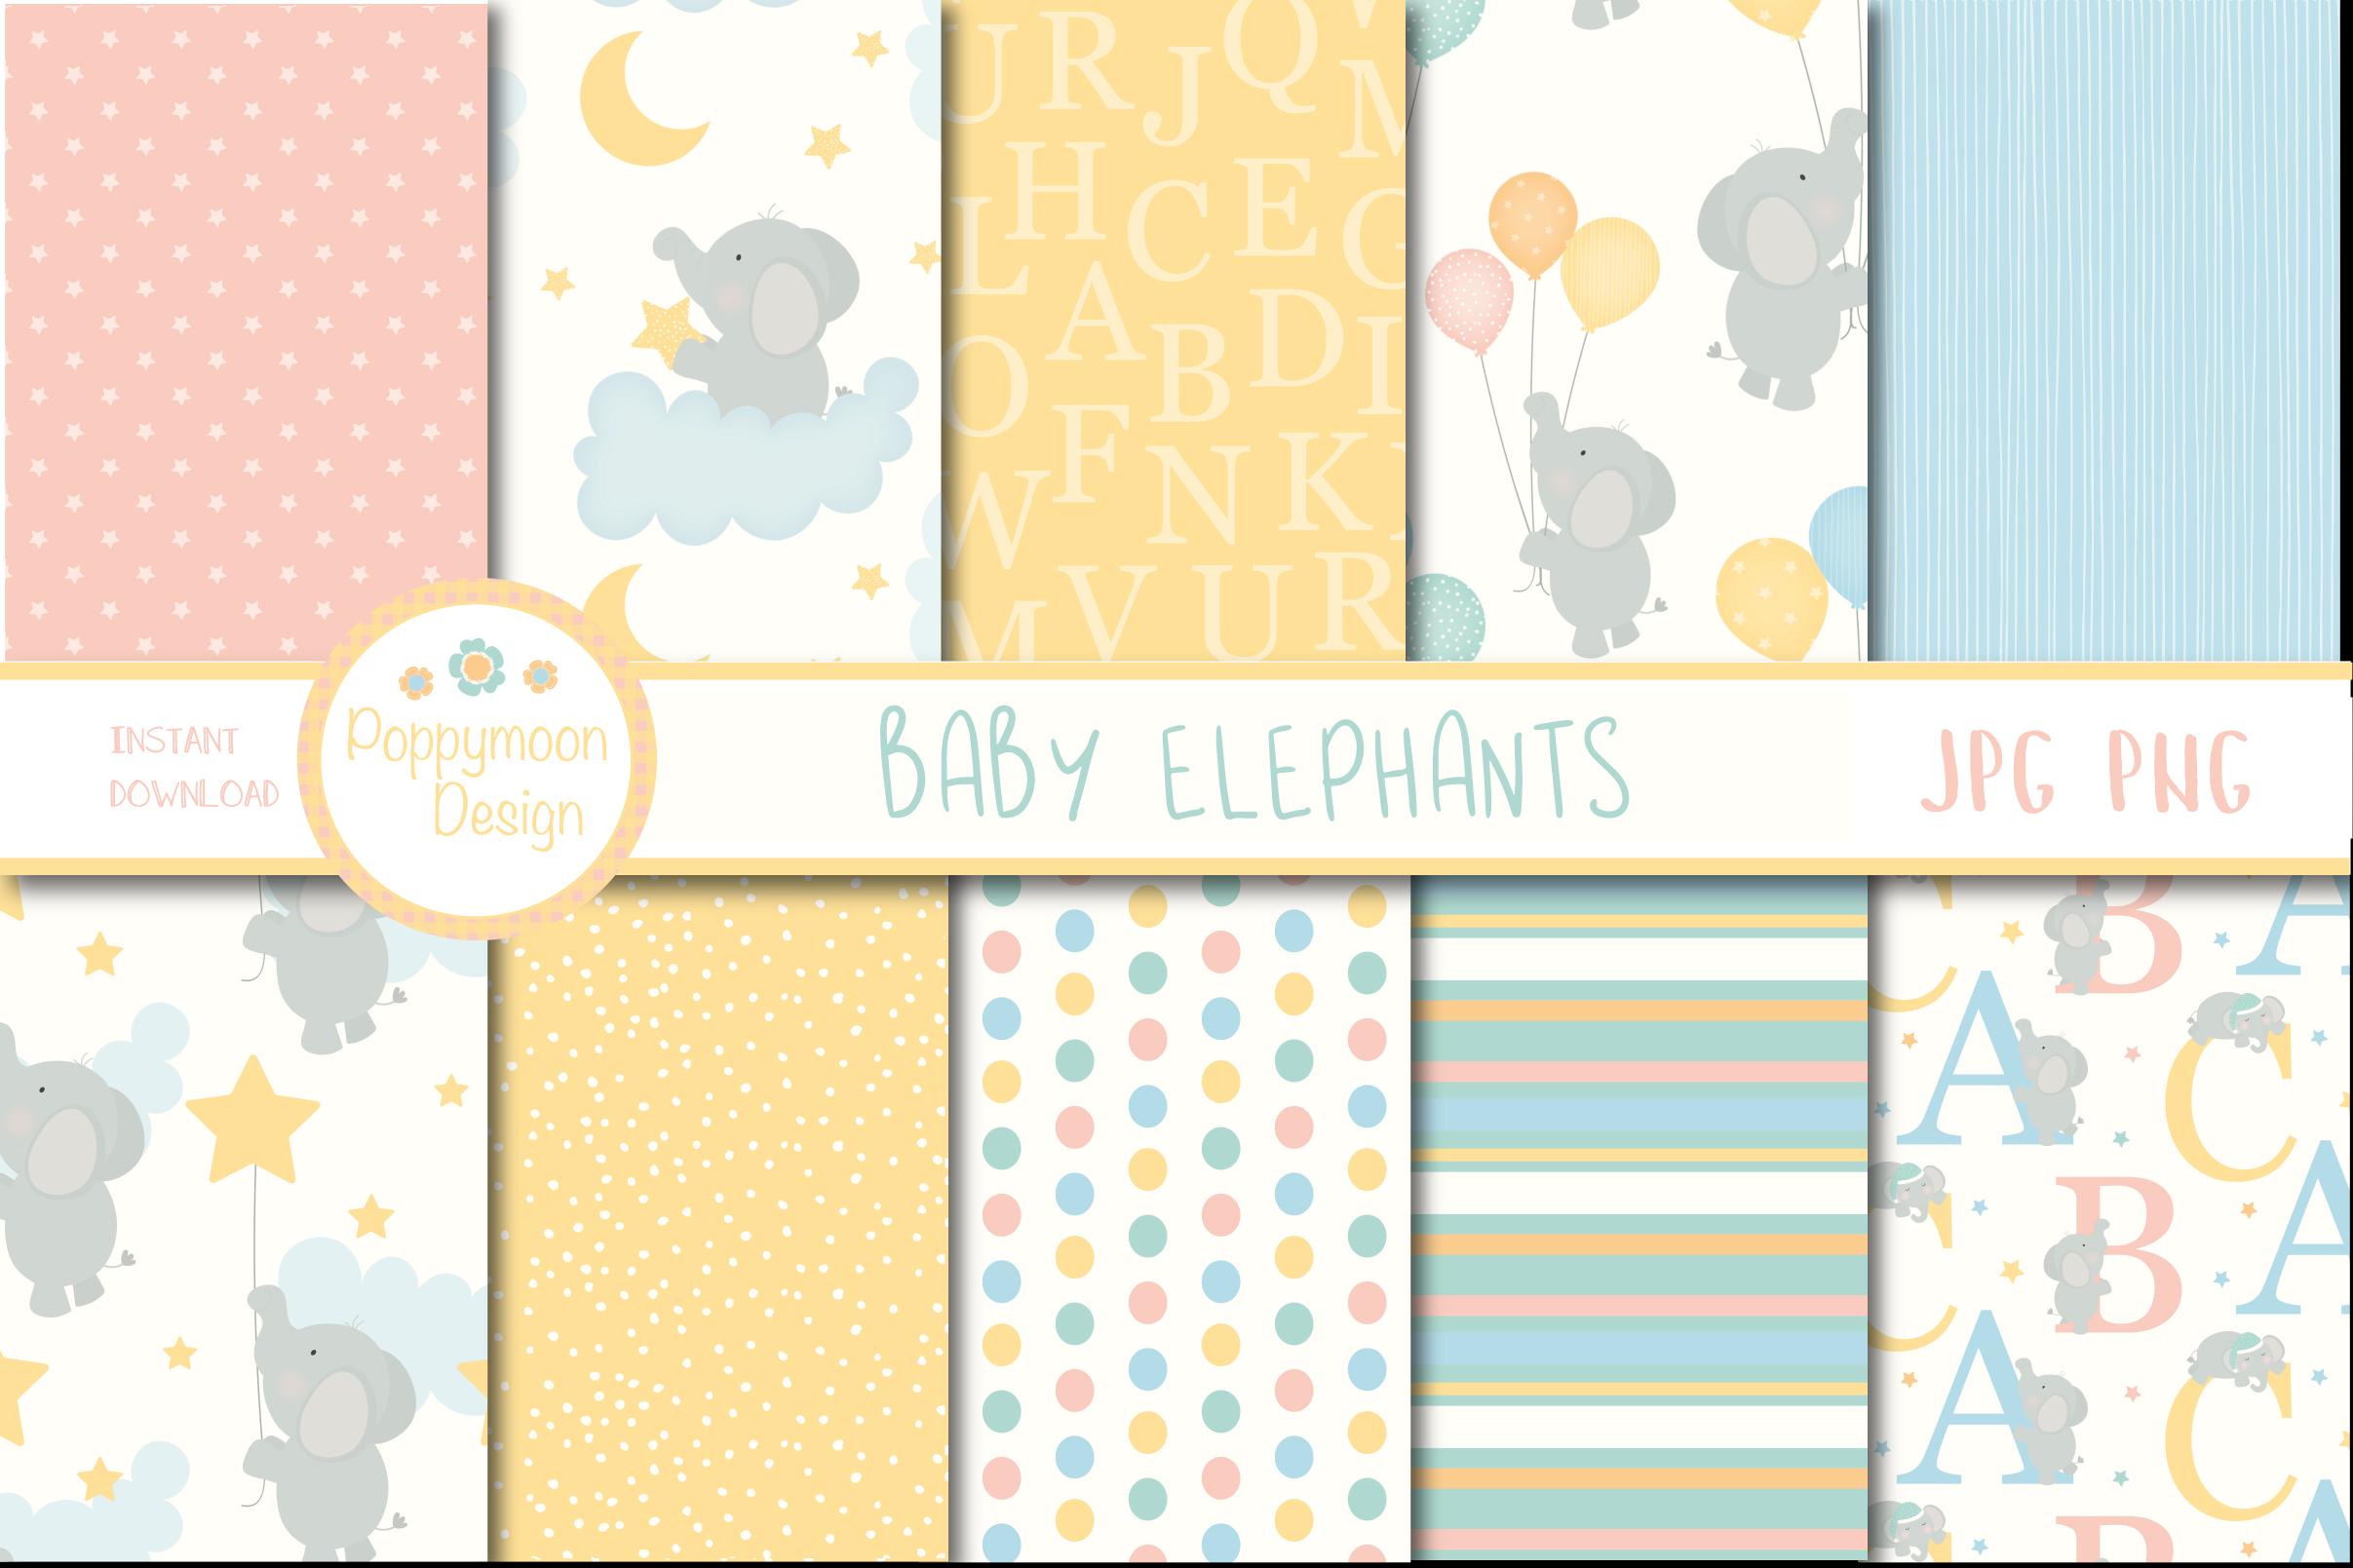 Baby Elephant Paper Graphic By Poppymoondesign Baby Elephant